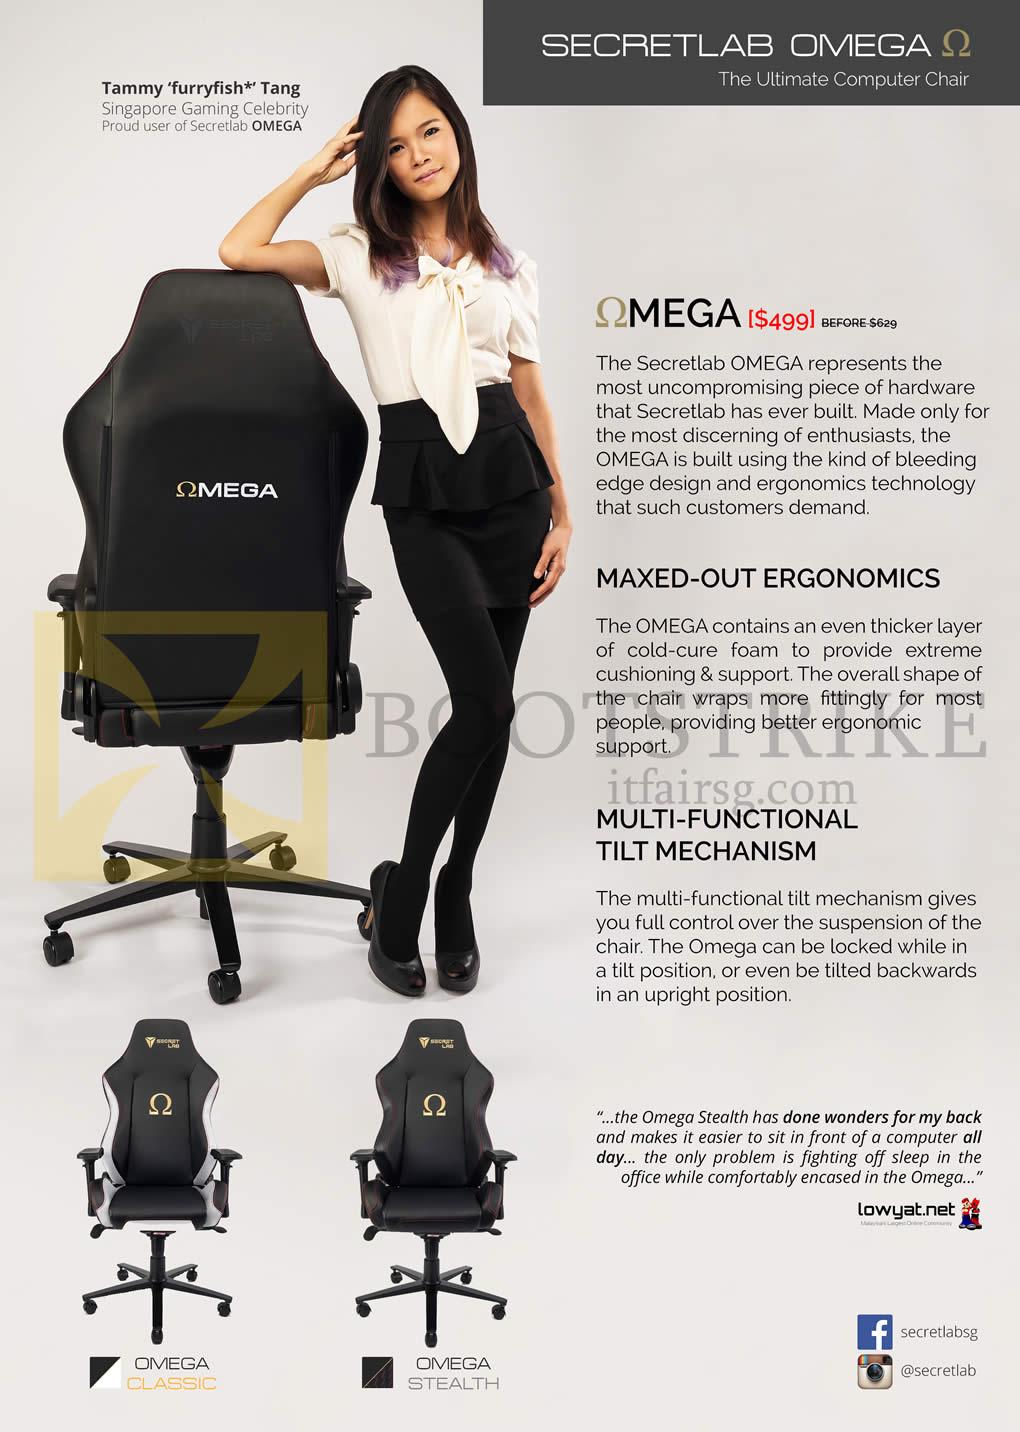 Secretlab Omega Chair Features It Show 2016 Price List